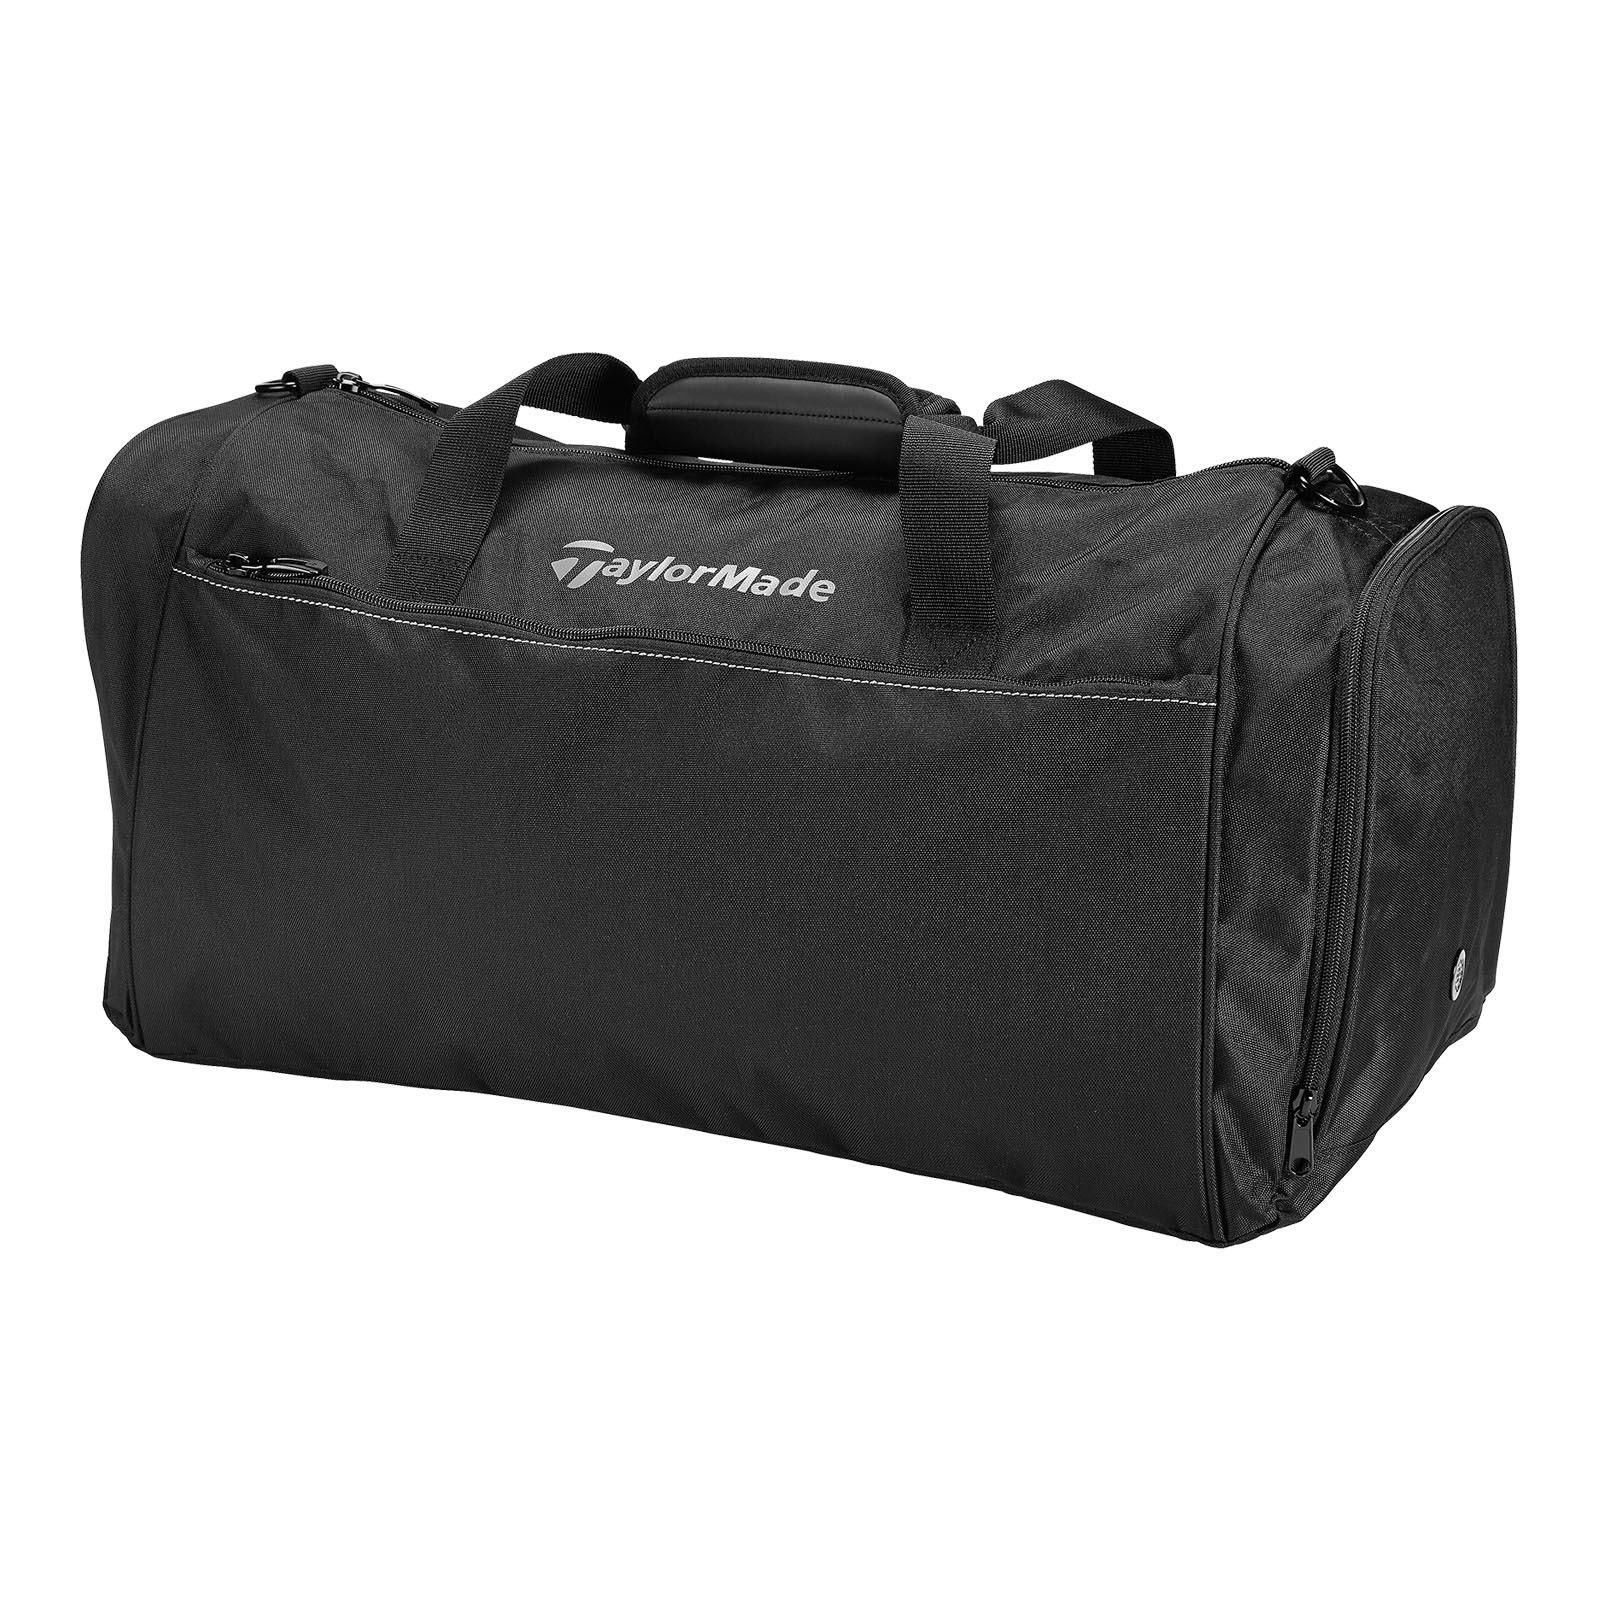 Taylormade TM Performance Medium Duffle Bag